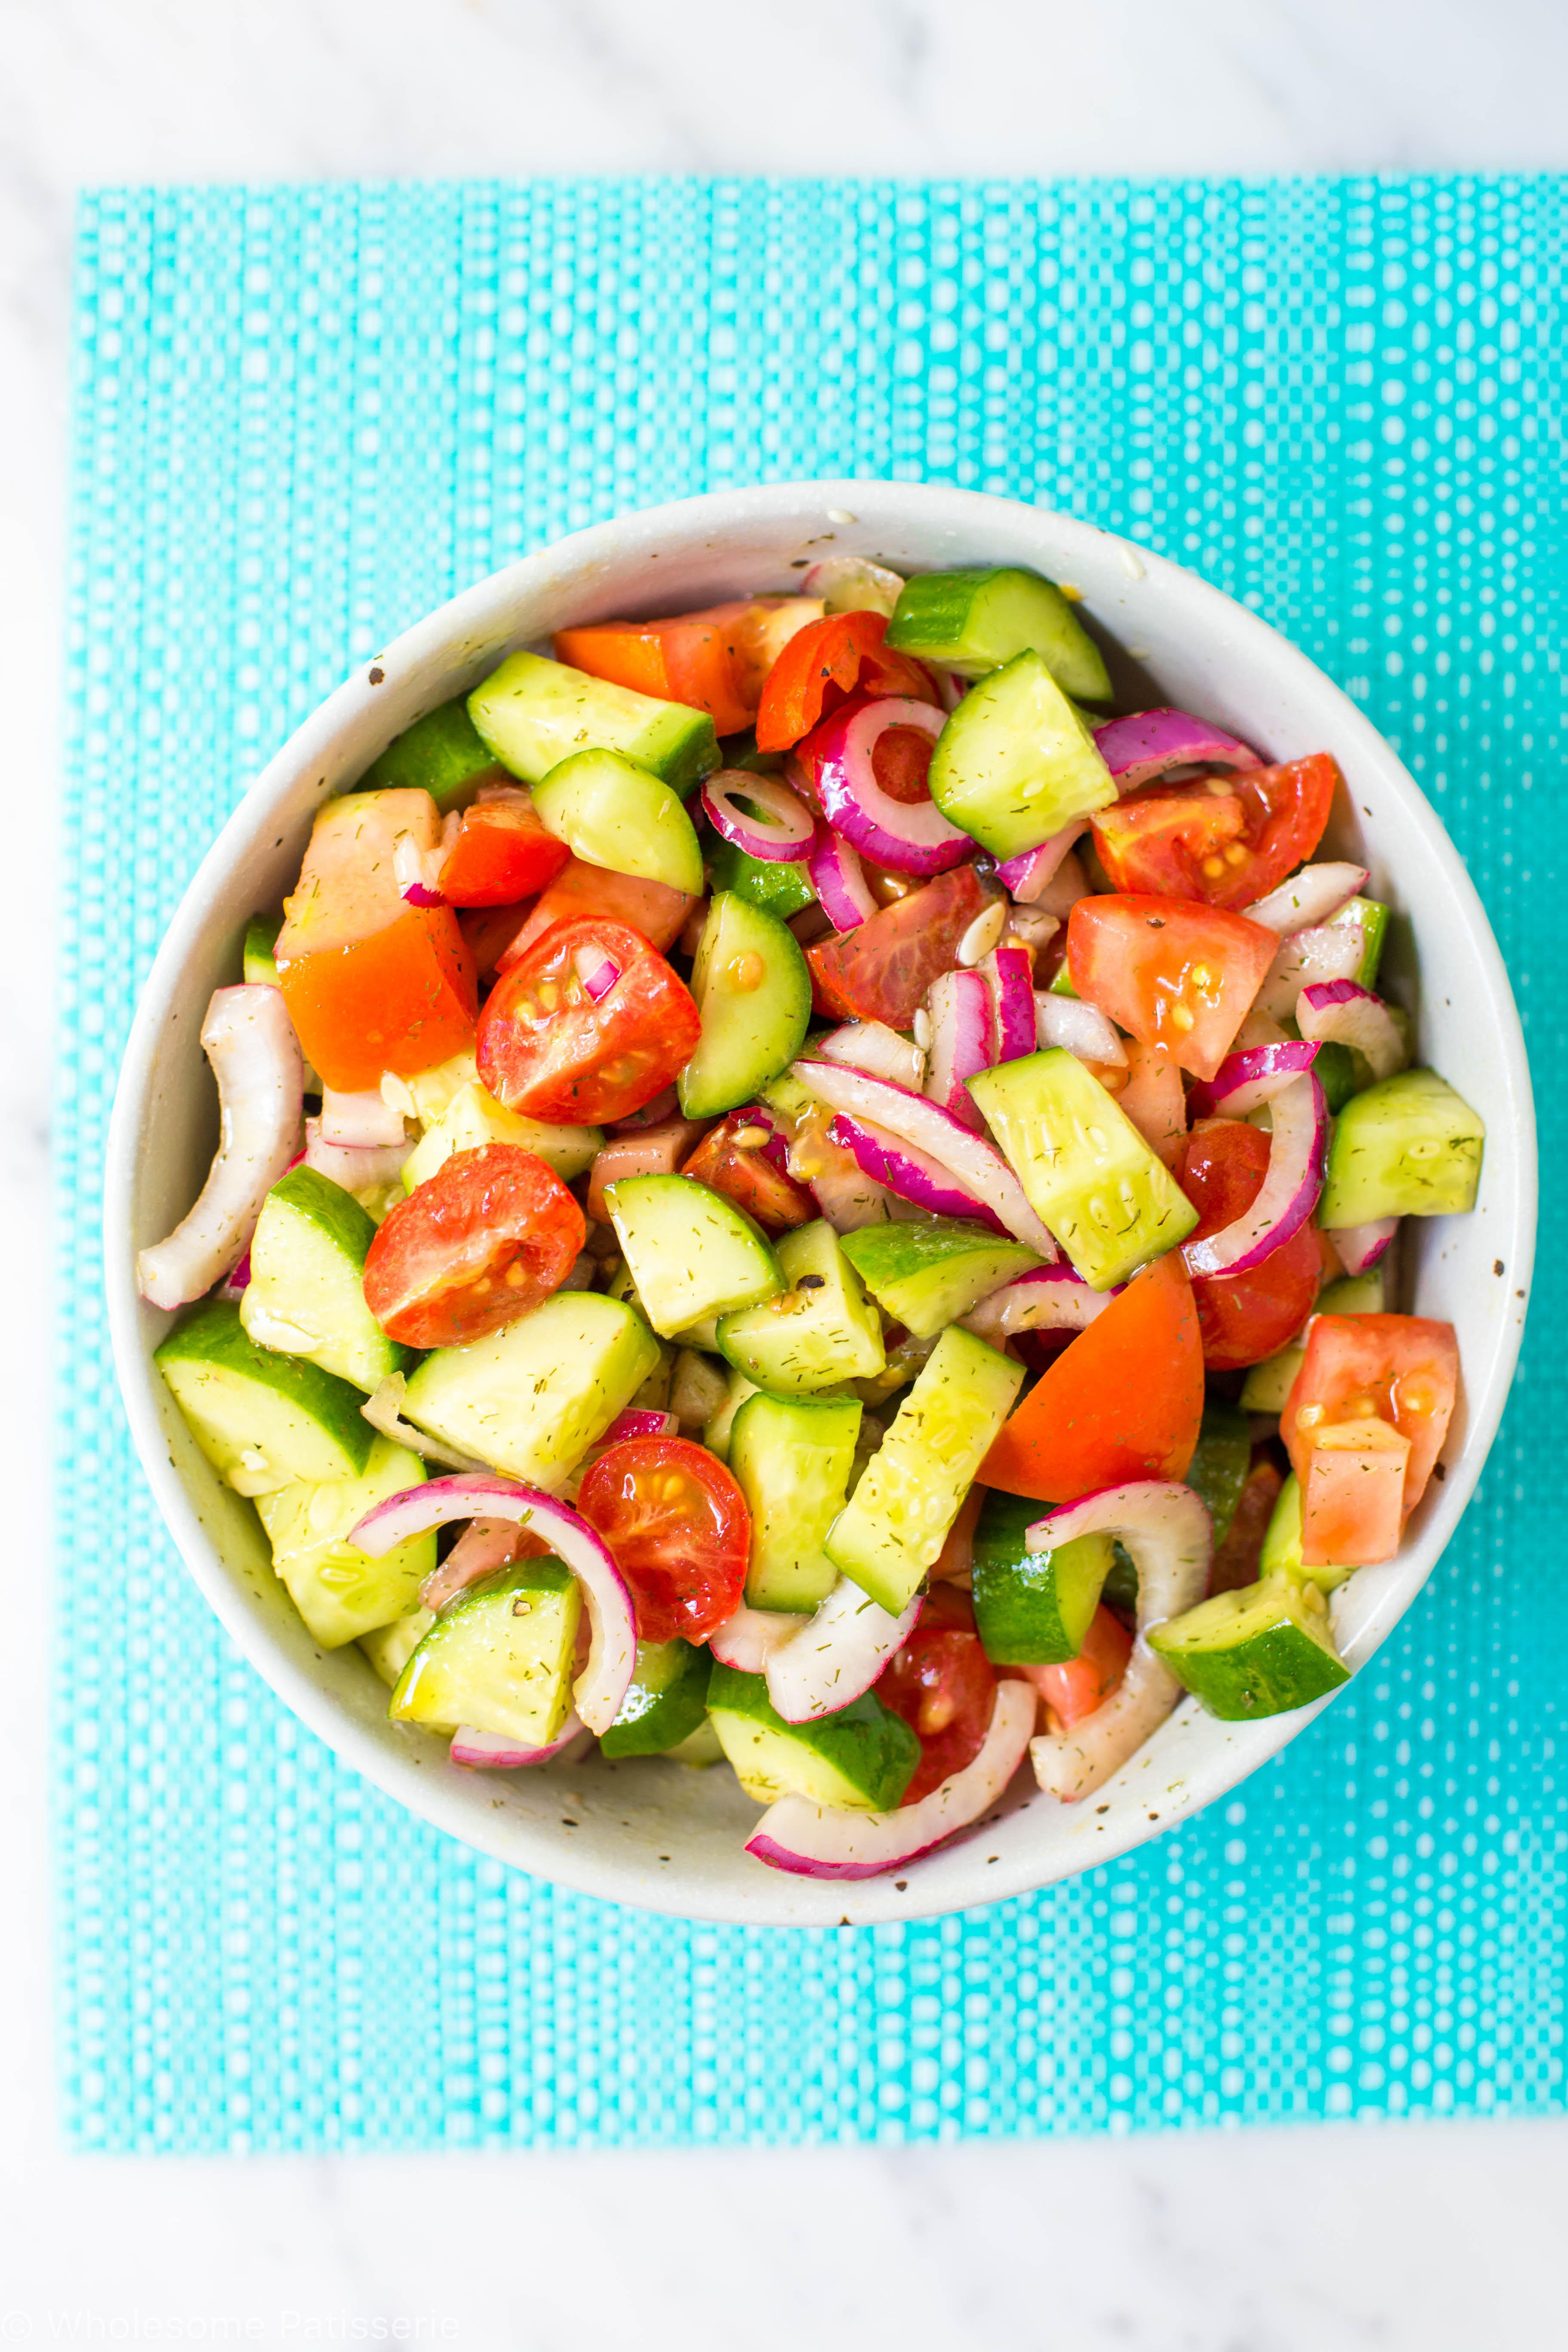 tomato-cucumber-onion-salad-dressing-easy-healthy-vegan-gluten-free-dairy-free-summer